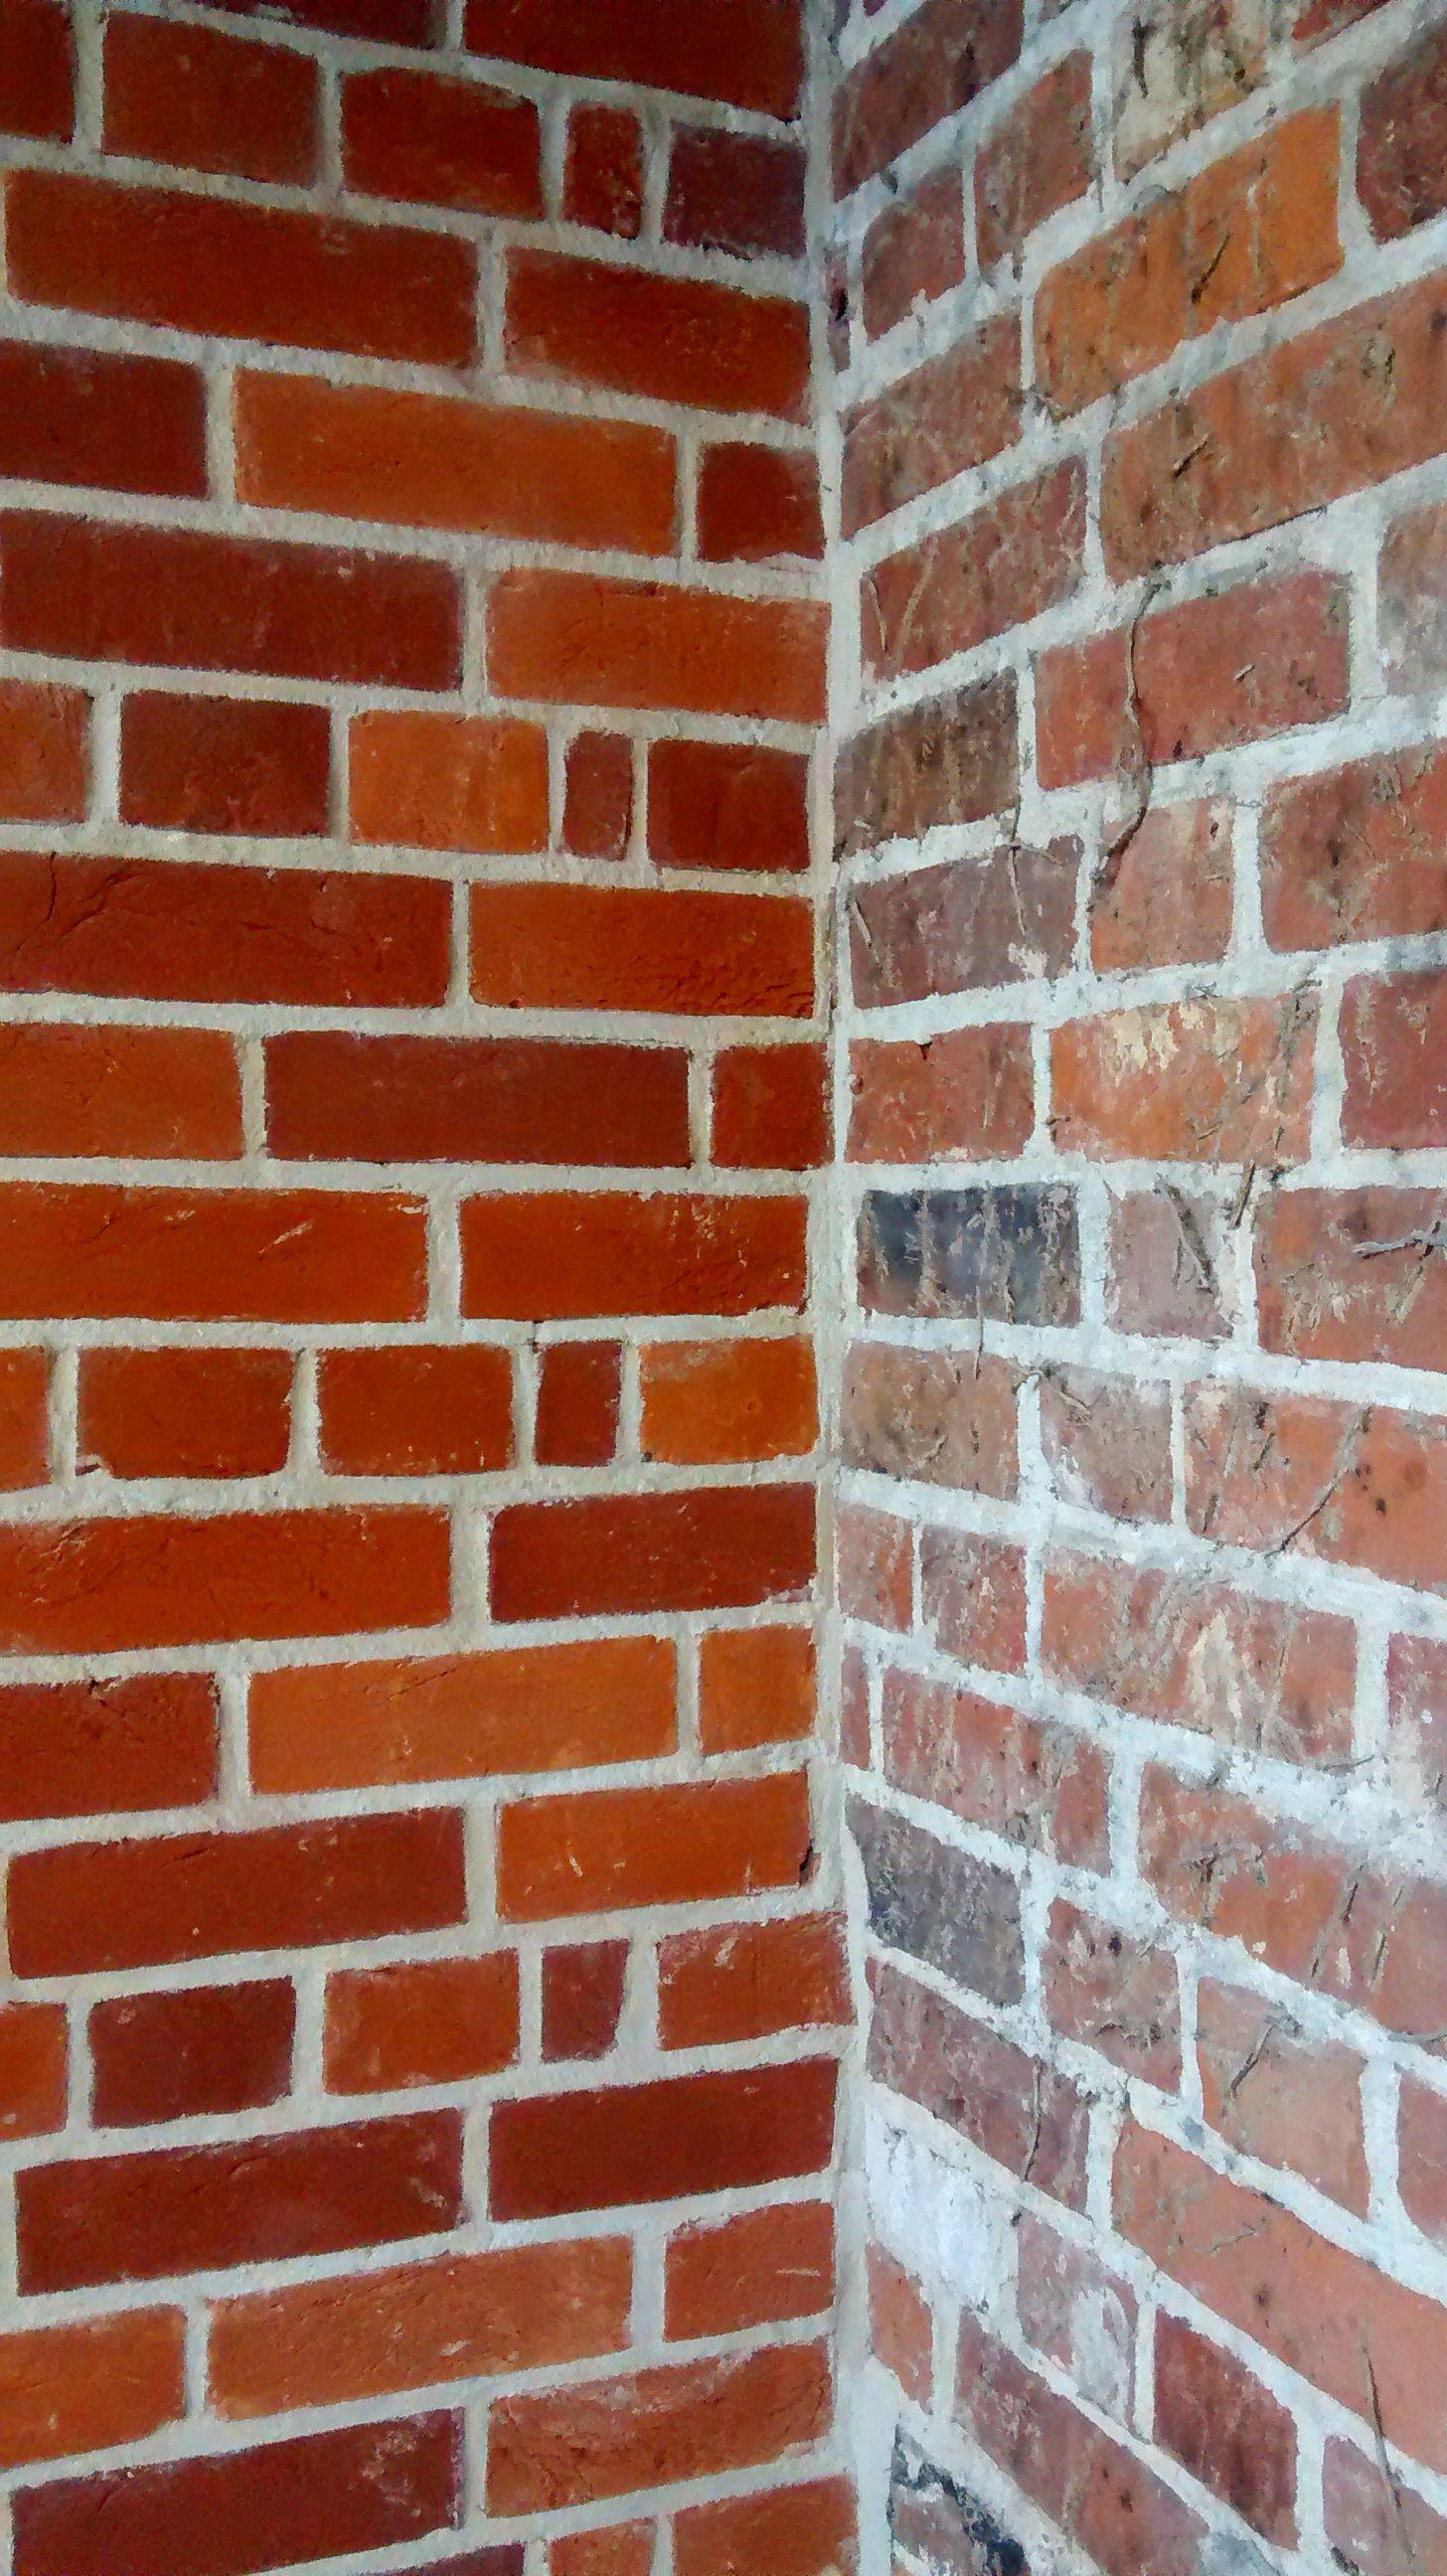 New Bricks Old Brick Brickwork